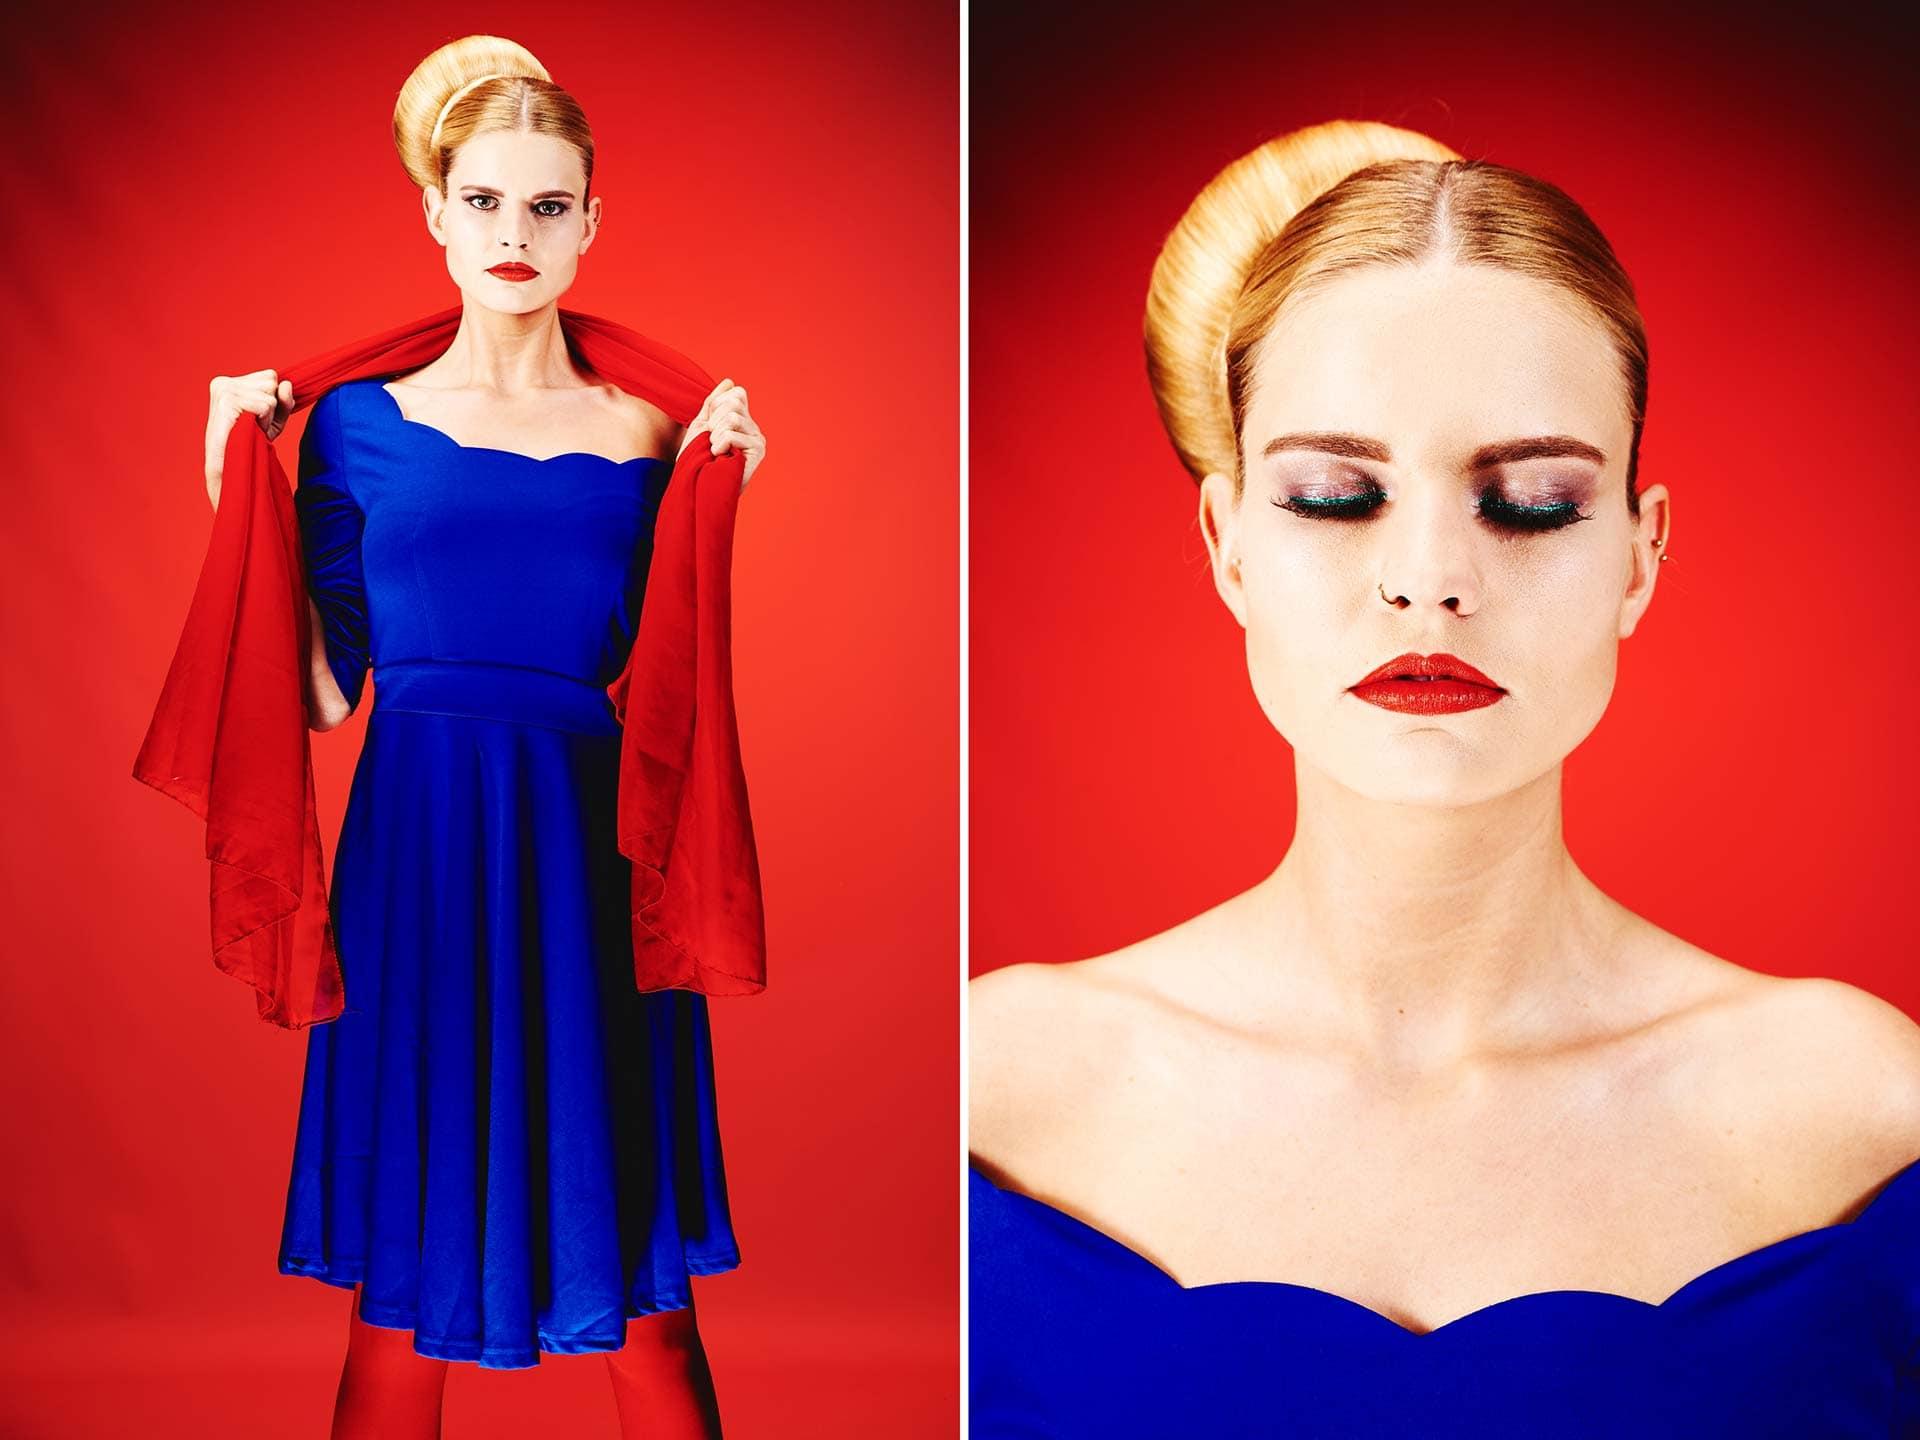 Fotograf Fürth, Color blocking Fotoshooting in der Make up Artist Schule Carola Hickl